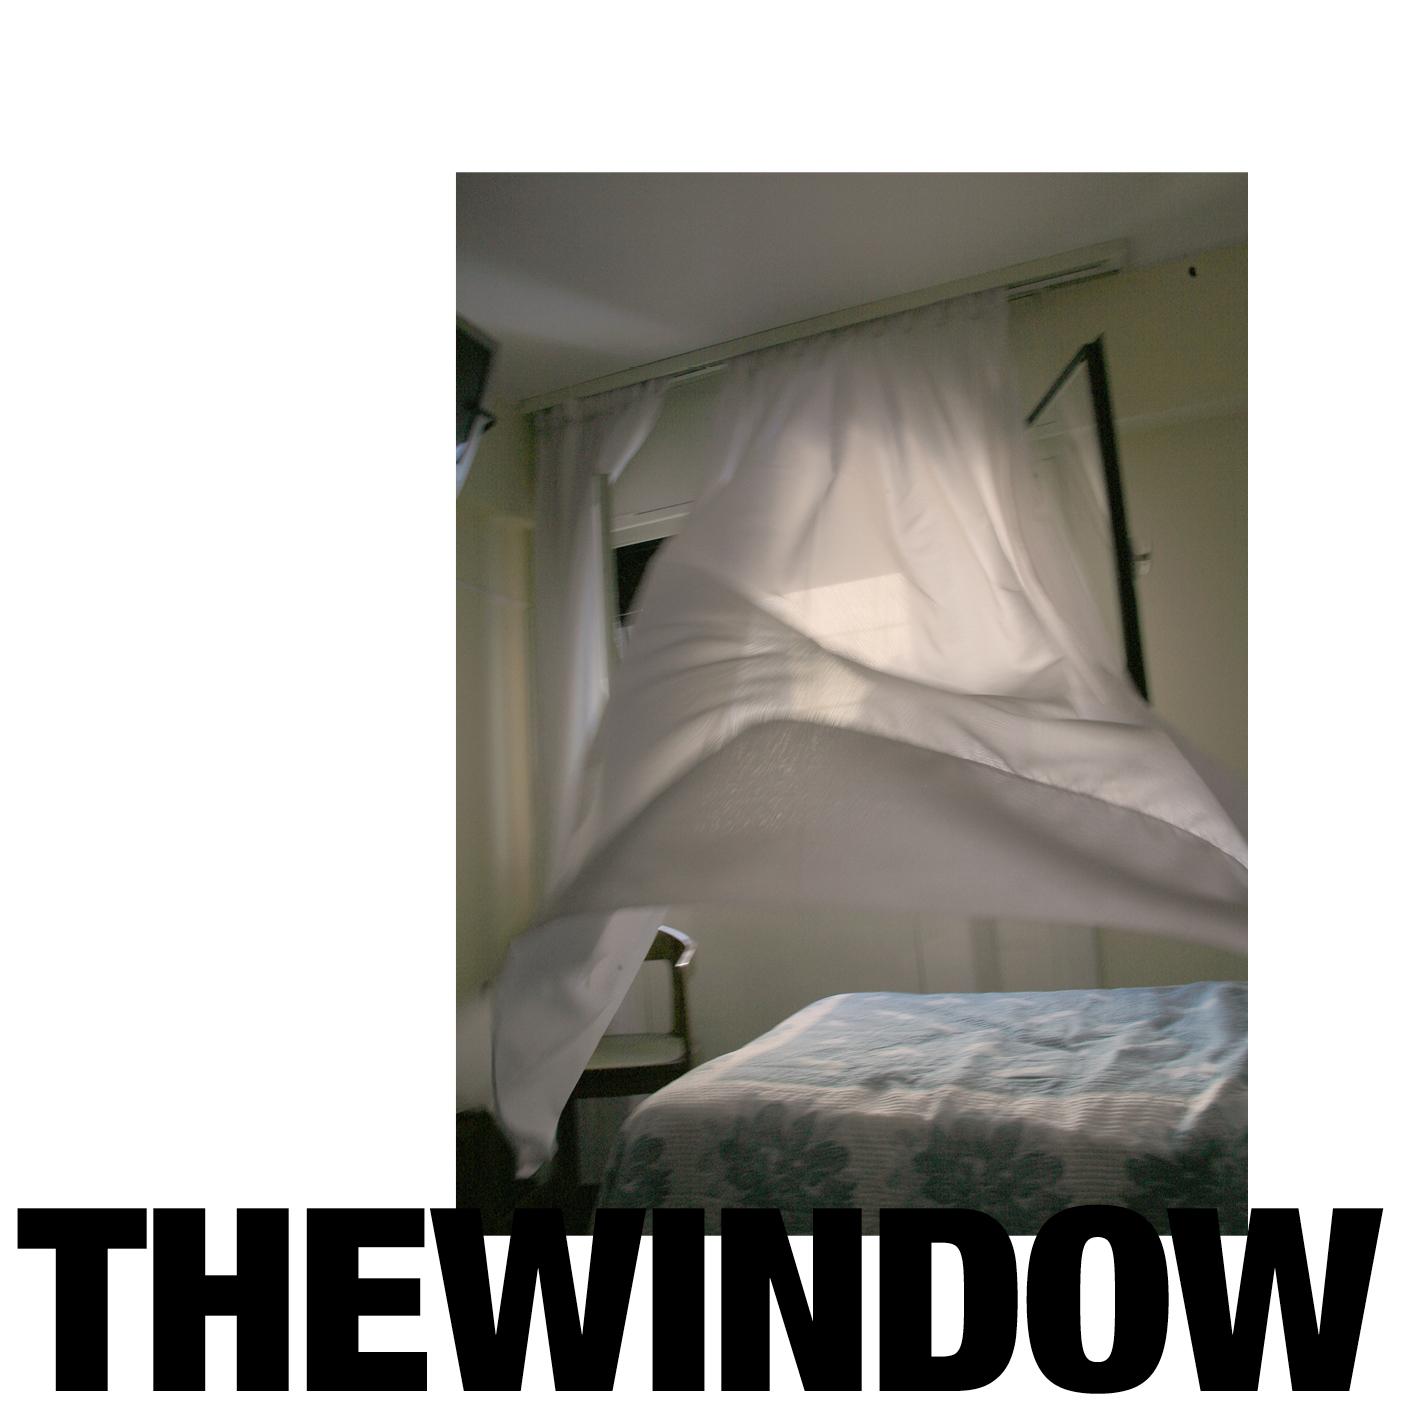 #throughthewindow